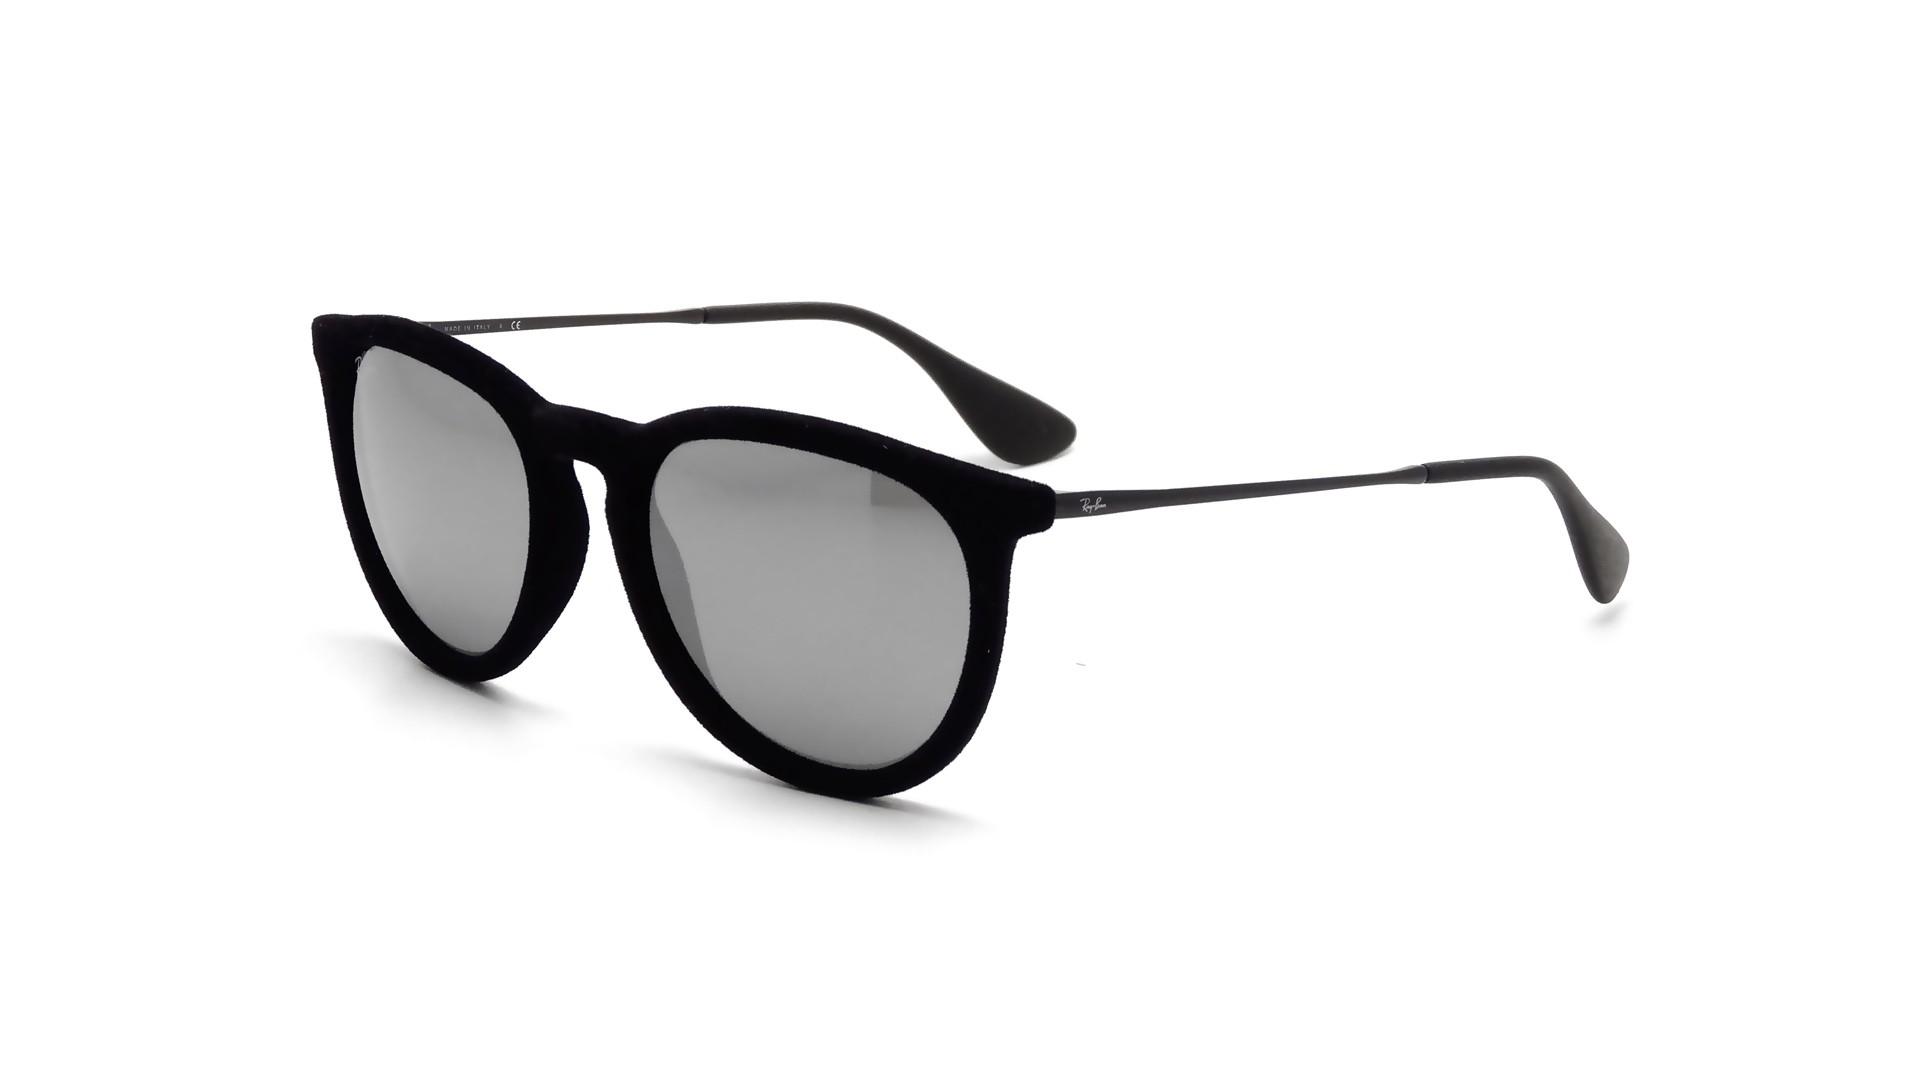 7e34d60ee8 Sunglasses Ray-Ban Erika Velvet Edition Black RB4171 6075 6G 54-18 Medium  Mirror